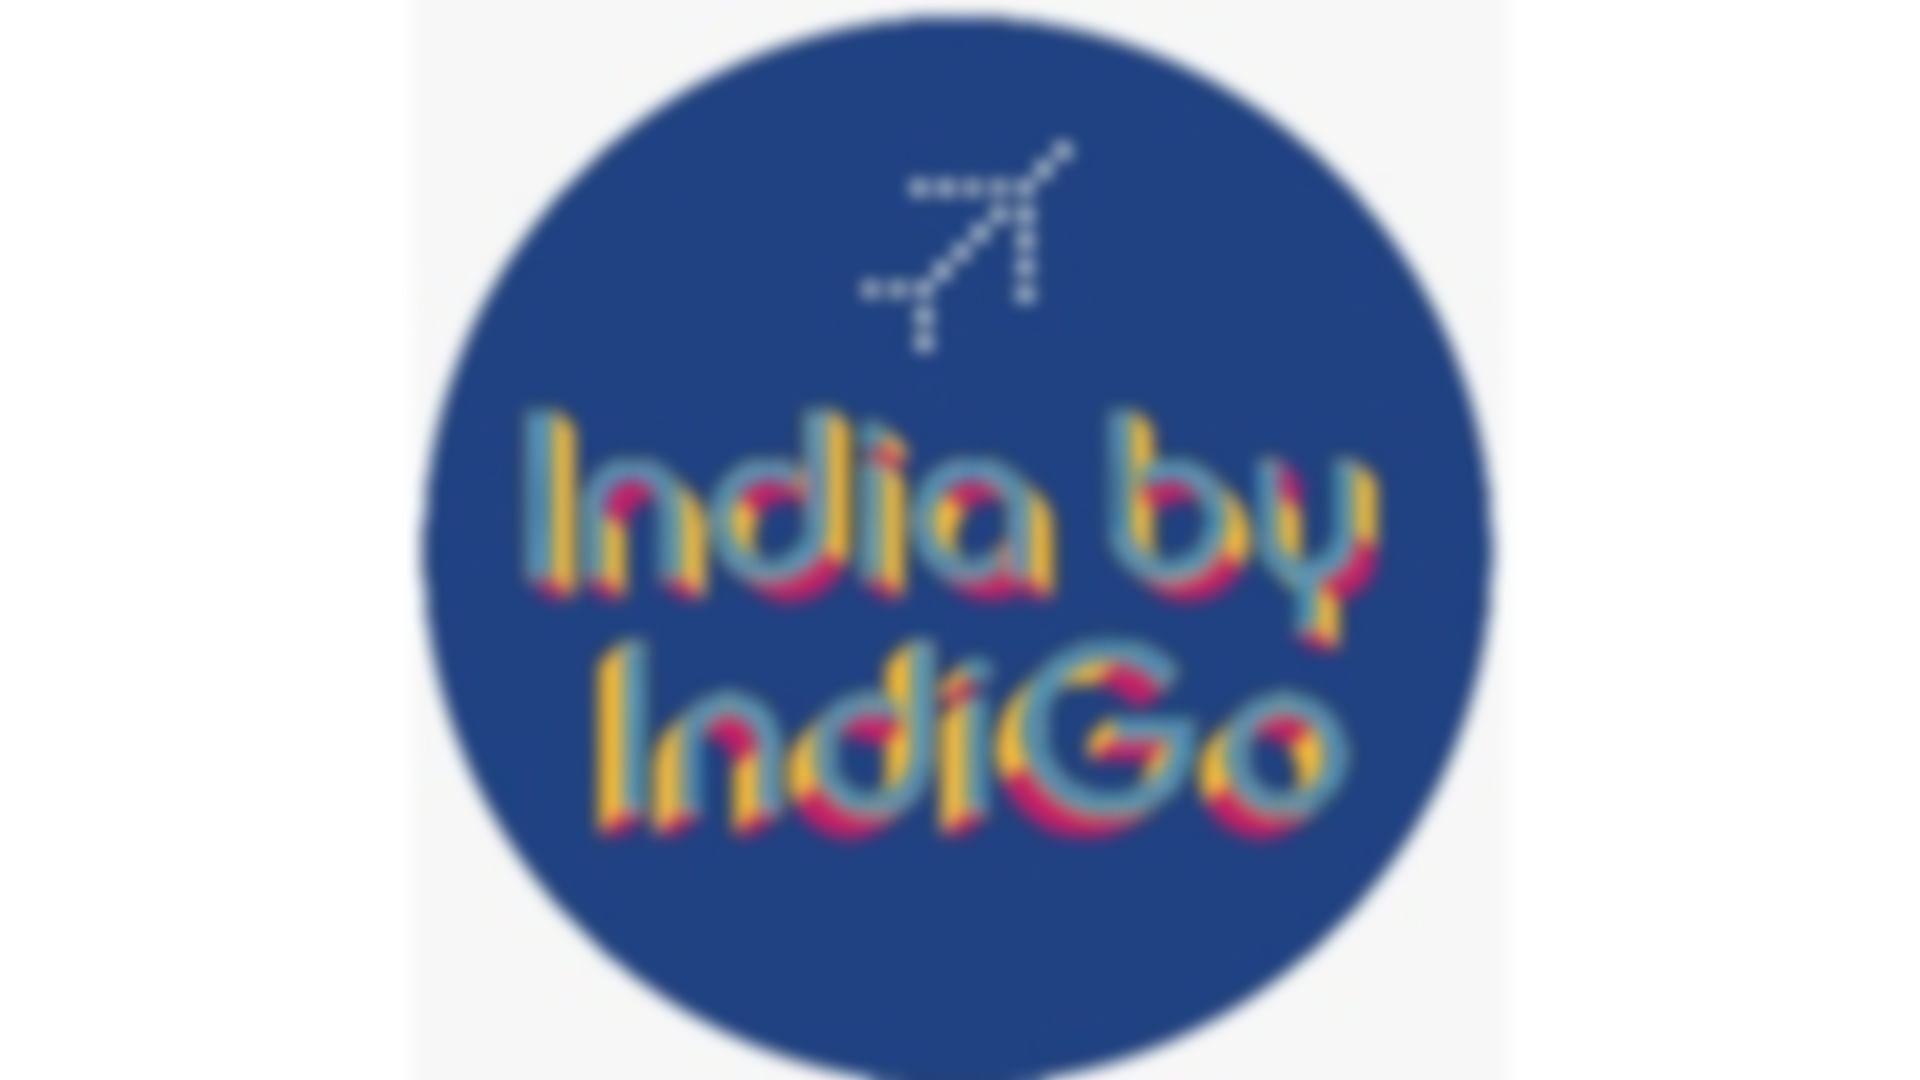 india by indigo